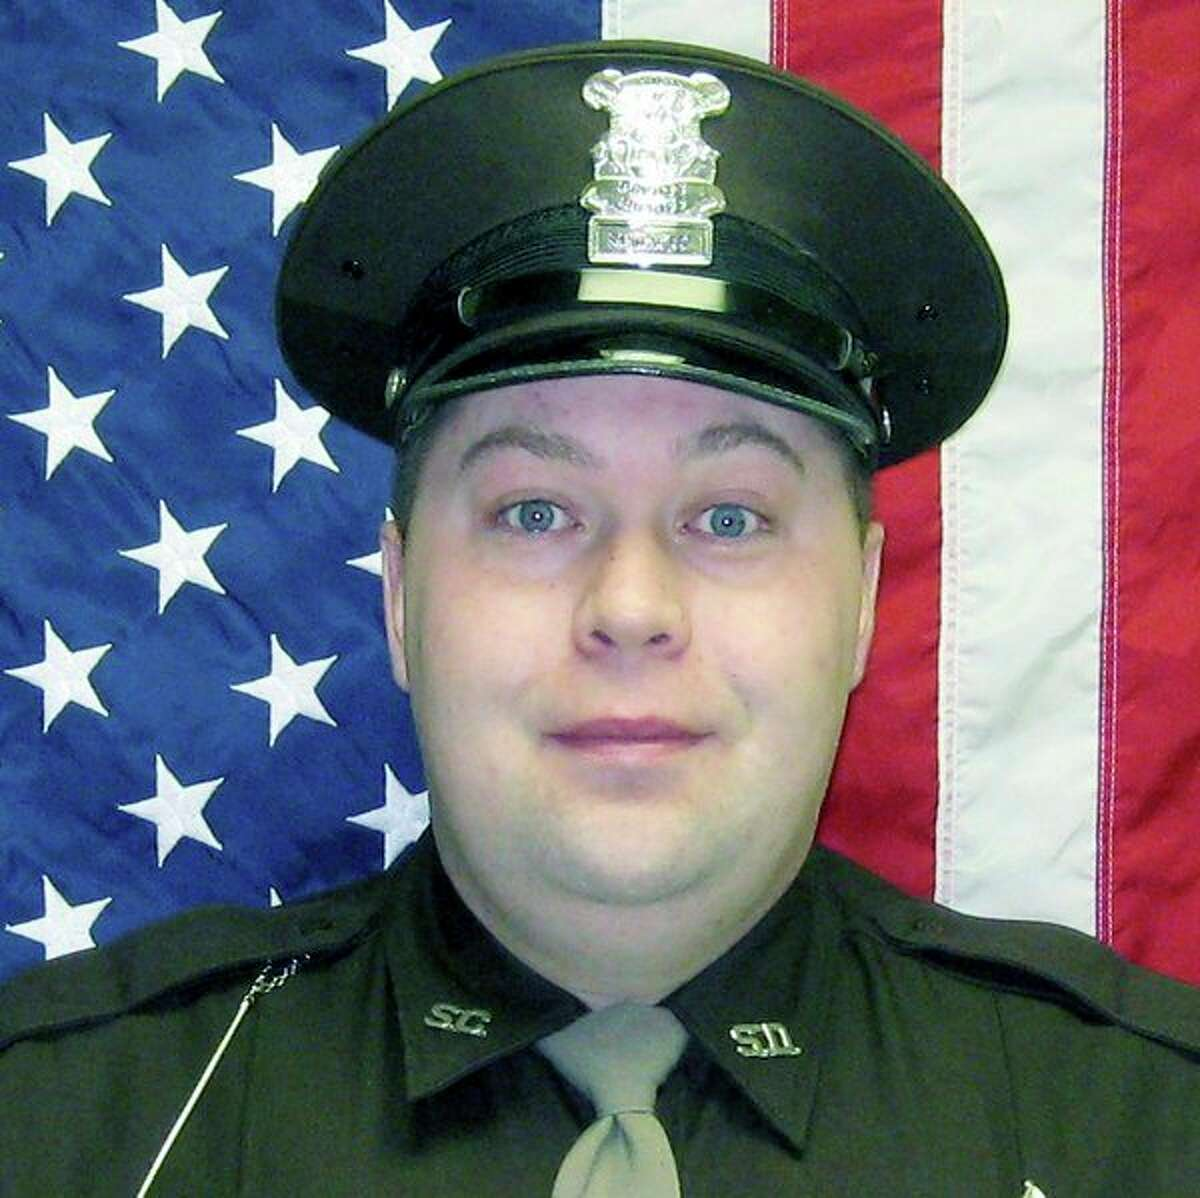 Uniform Services Lt. Nathan Smith